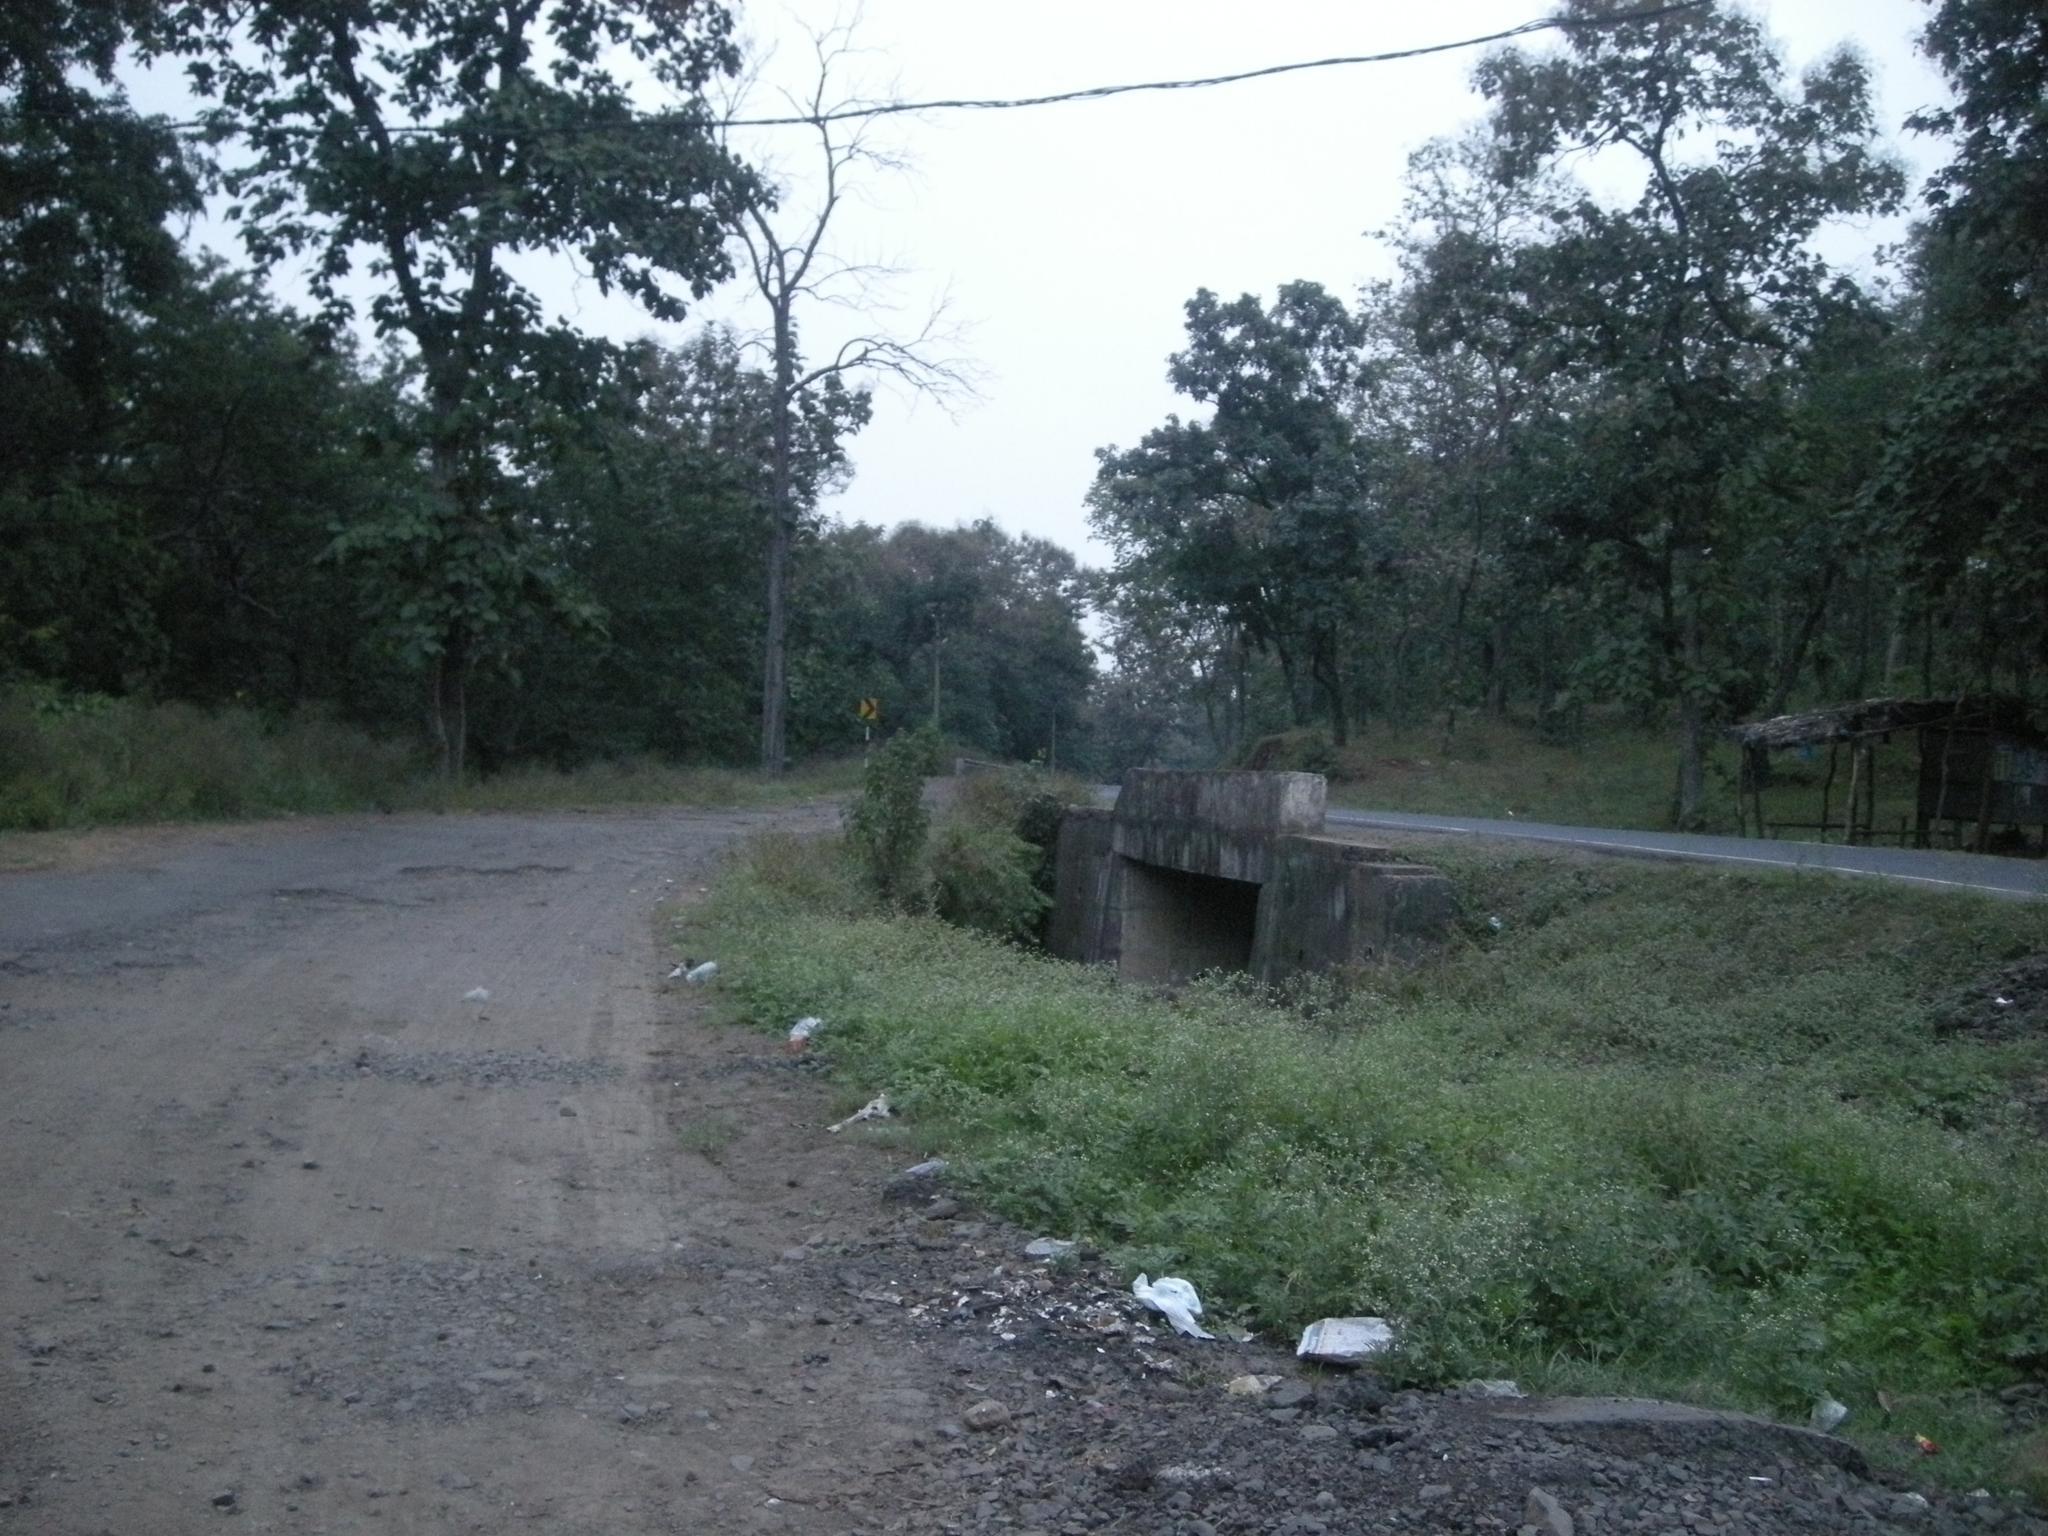 ROAD SIDE by Rajesh Khurana